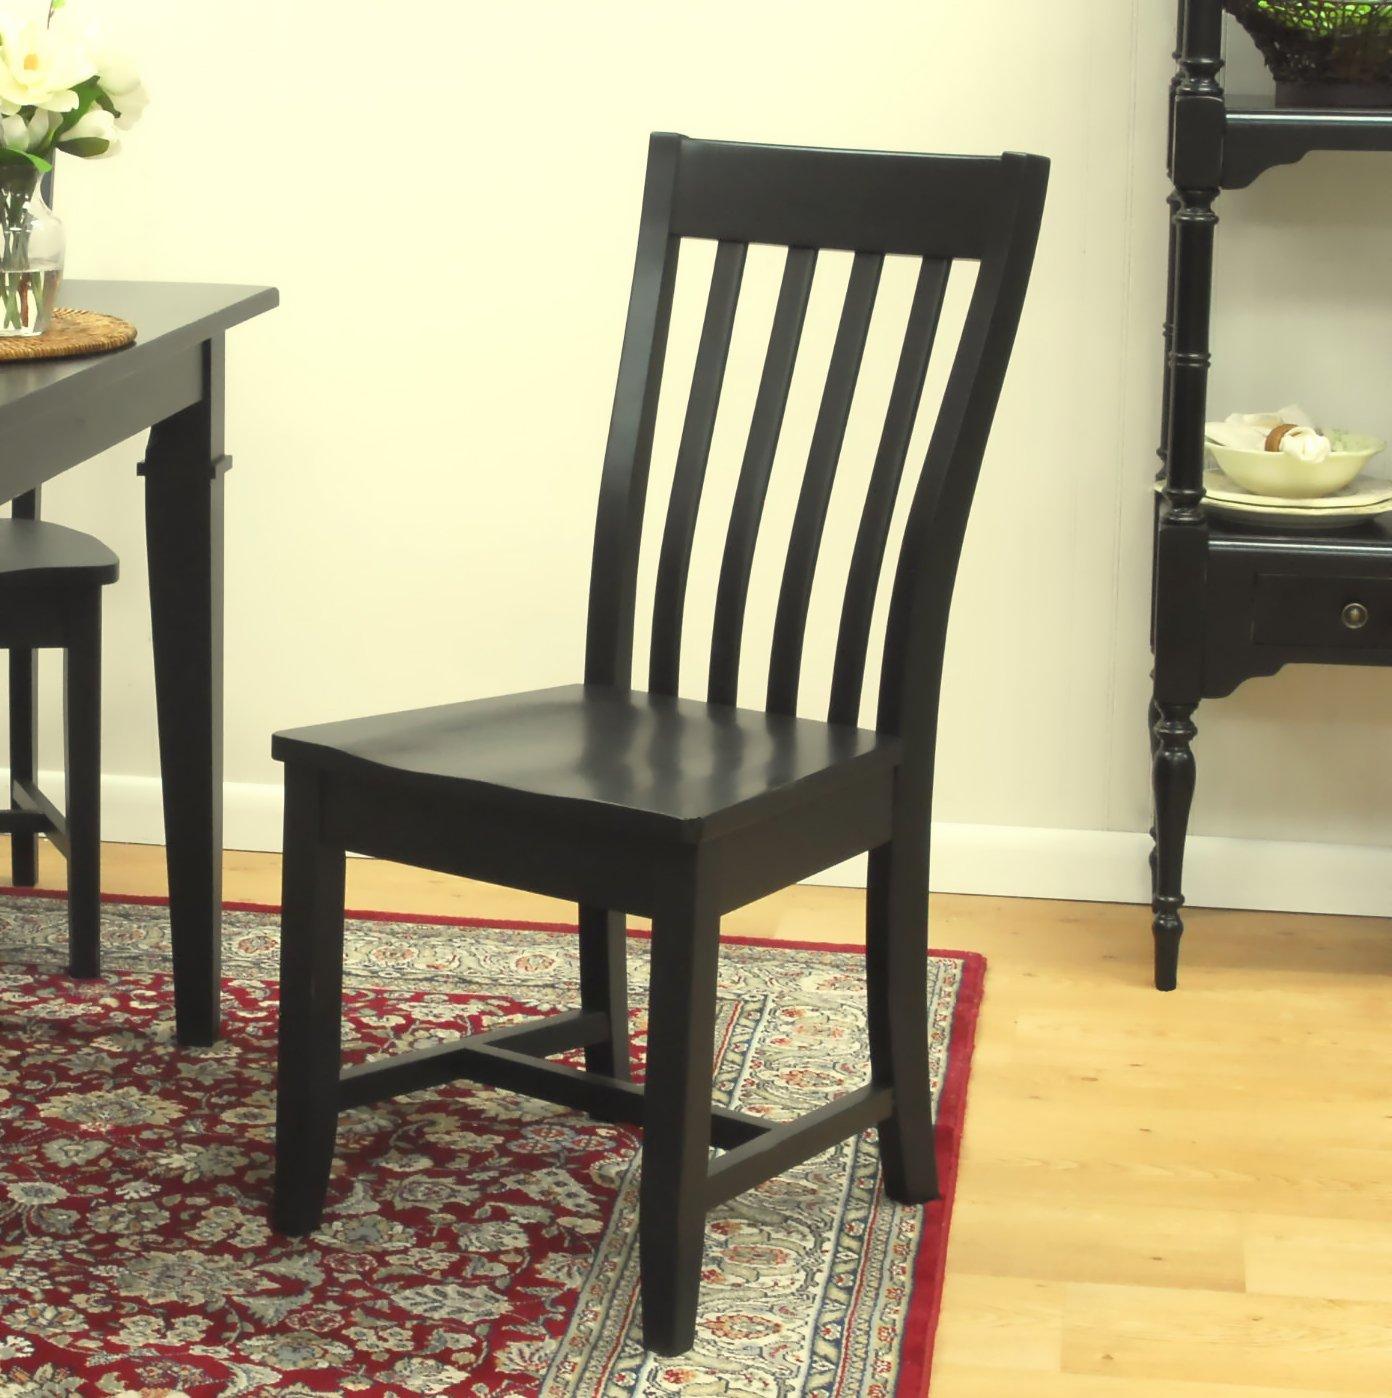 Schoolhouse Chairs Black Black Schoolhouse Chairs Set of 2 Black